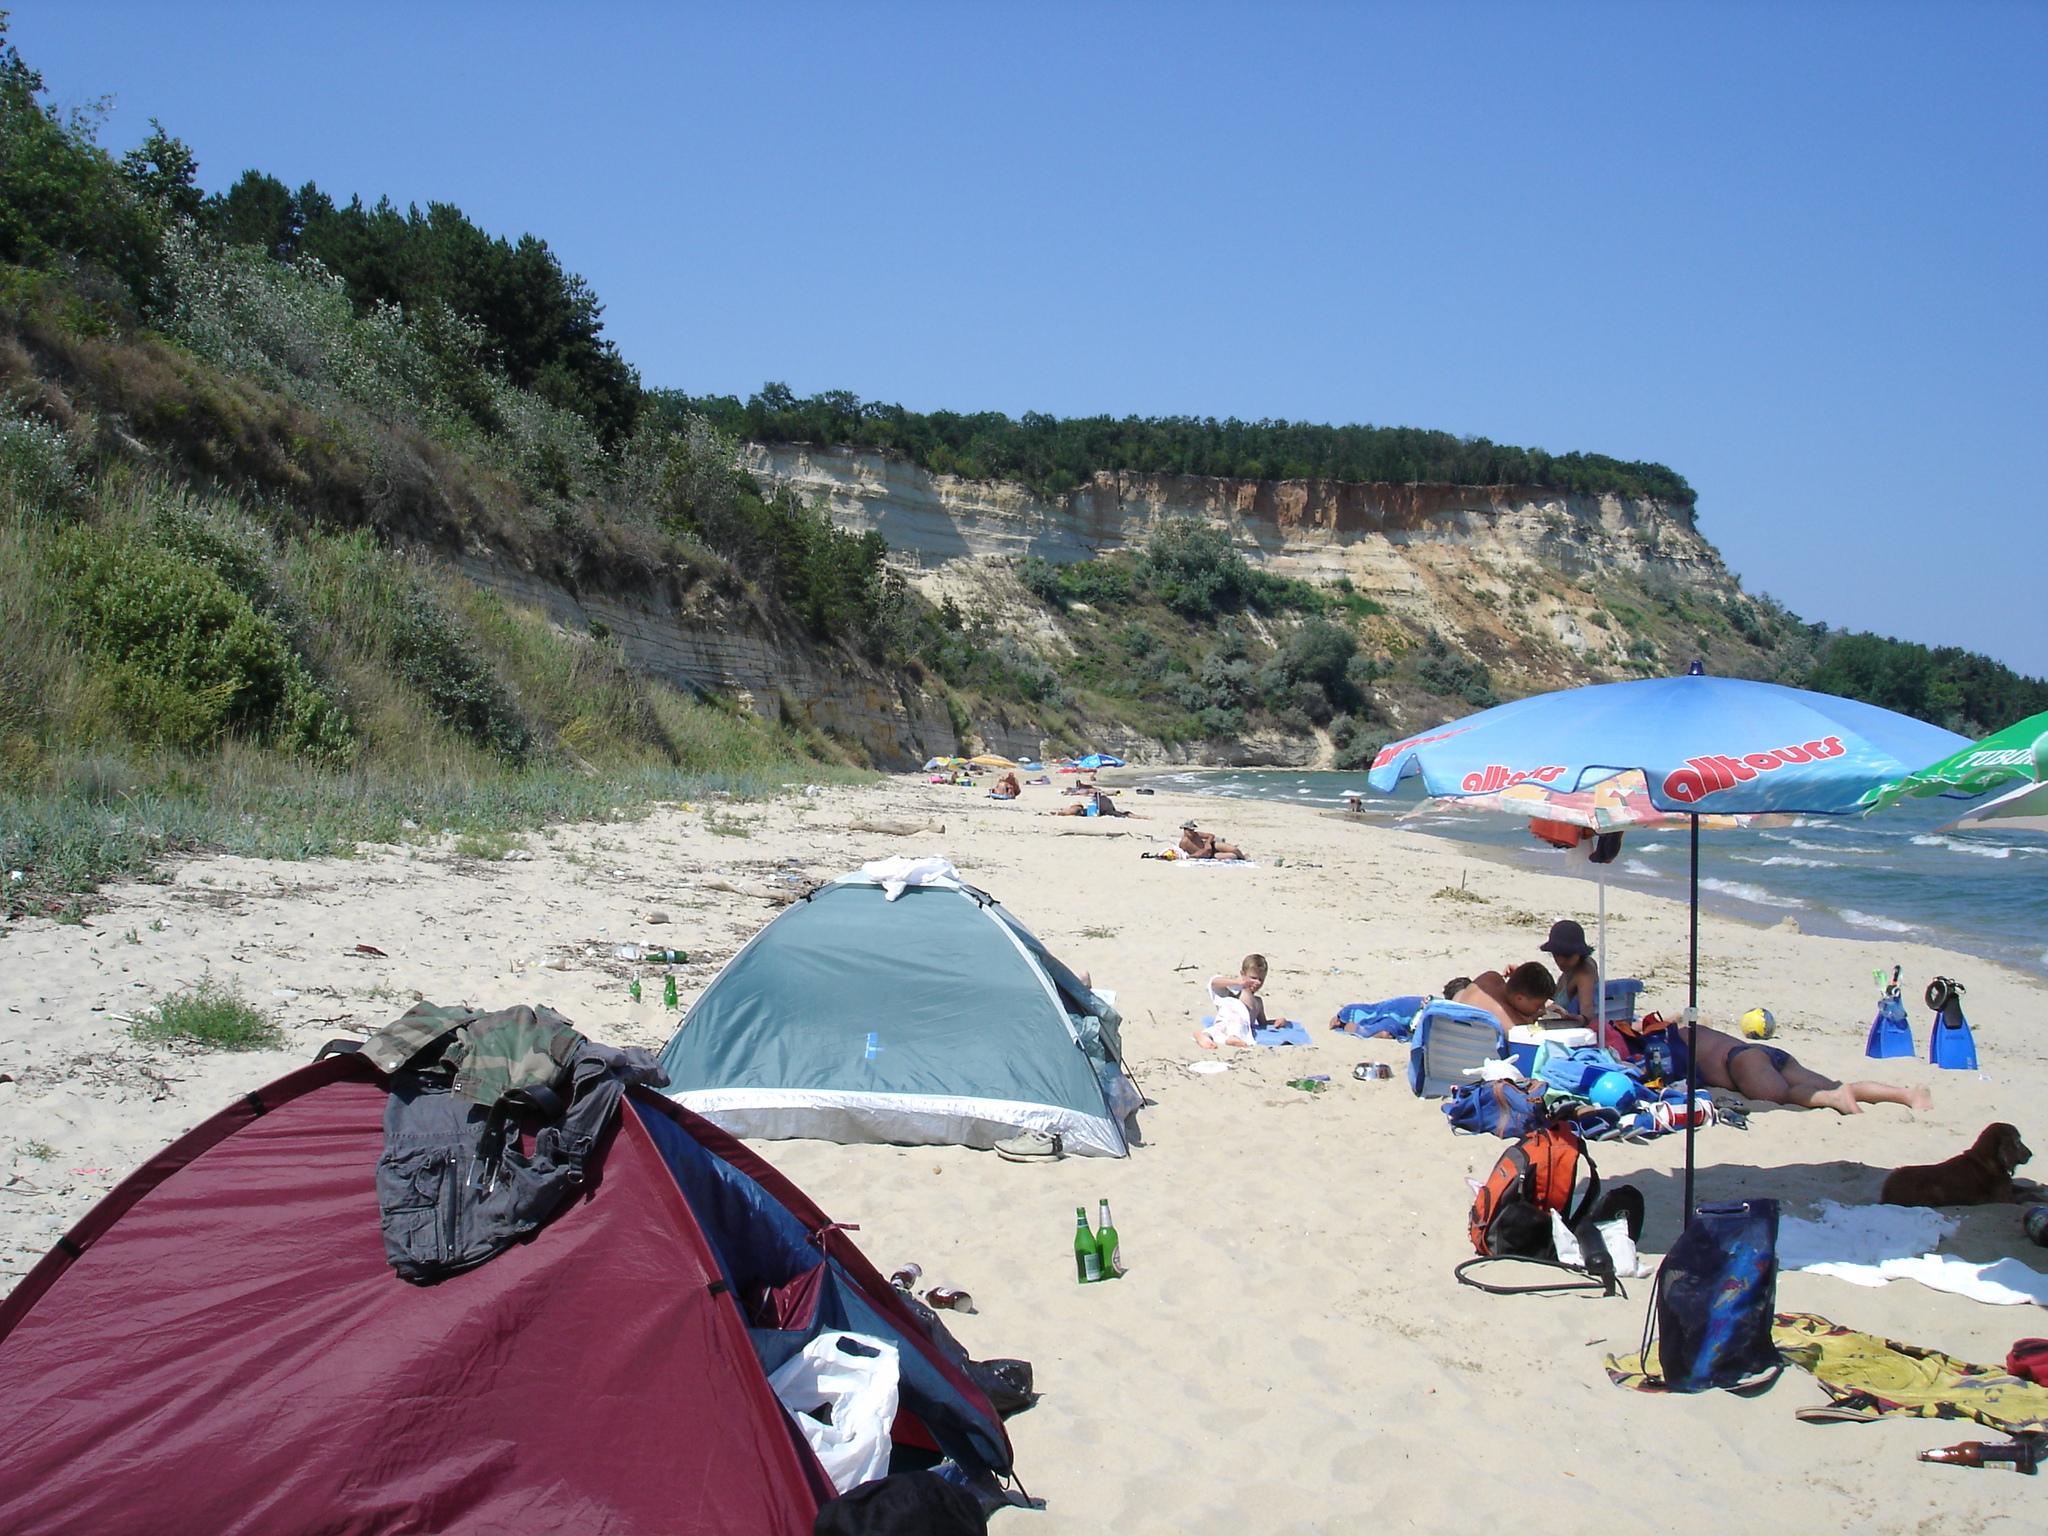 Camping Sites Near Panama City Beach Flcamping Spots In Panama City Beach